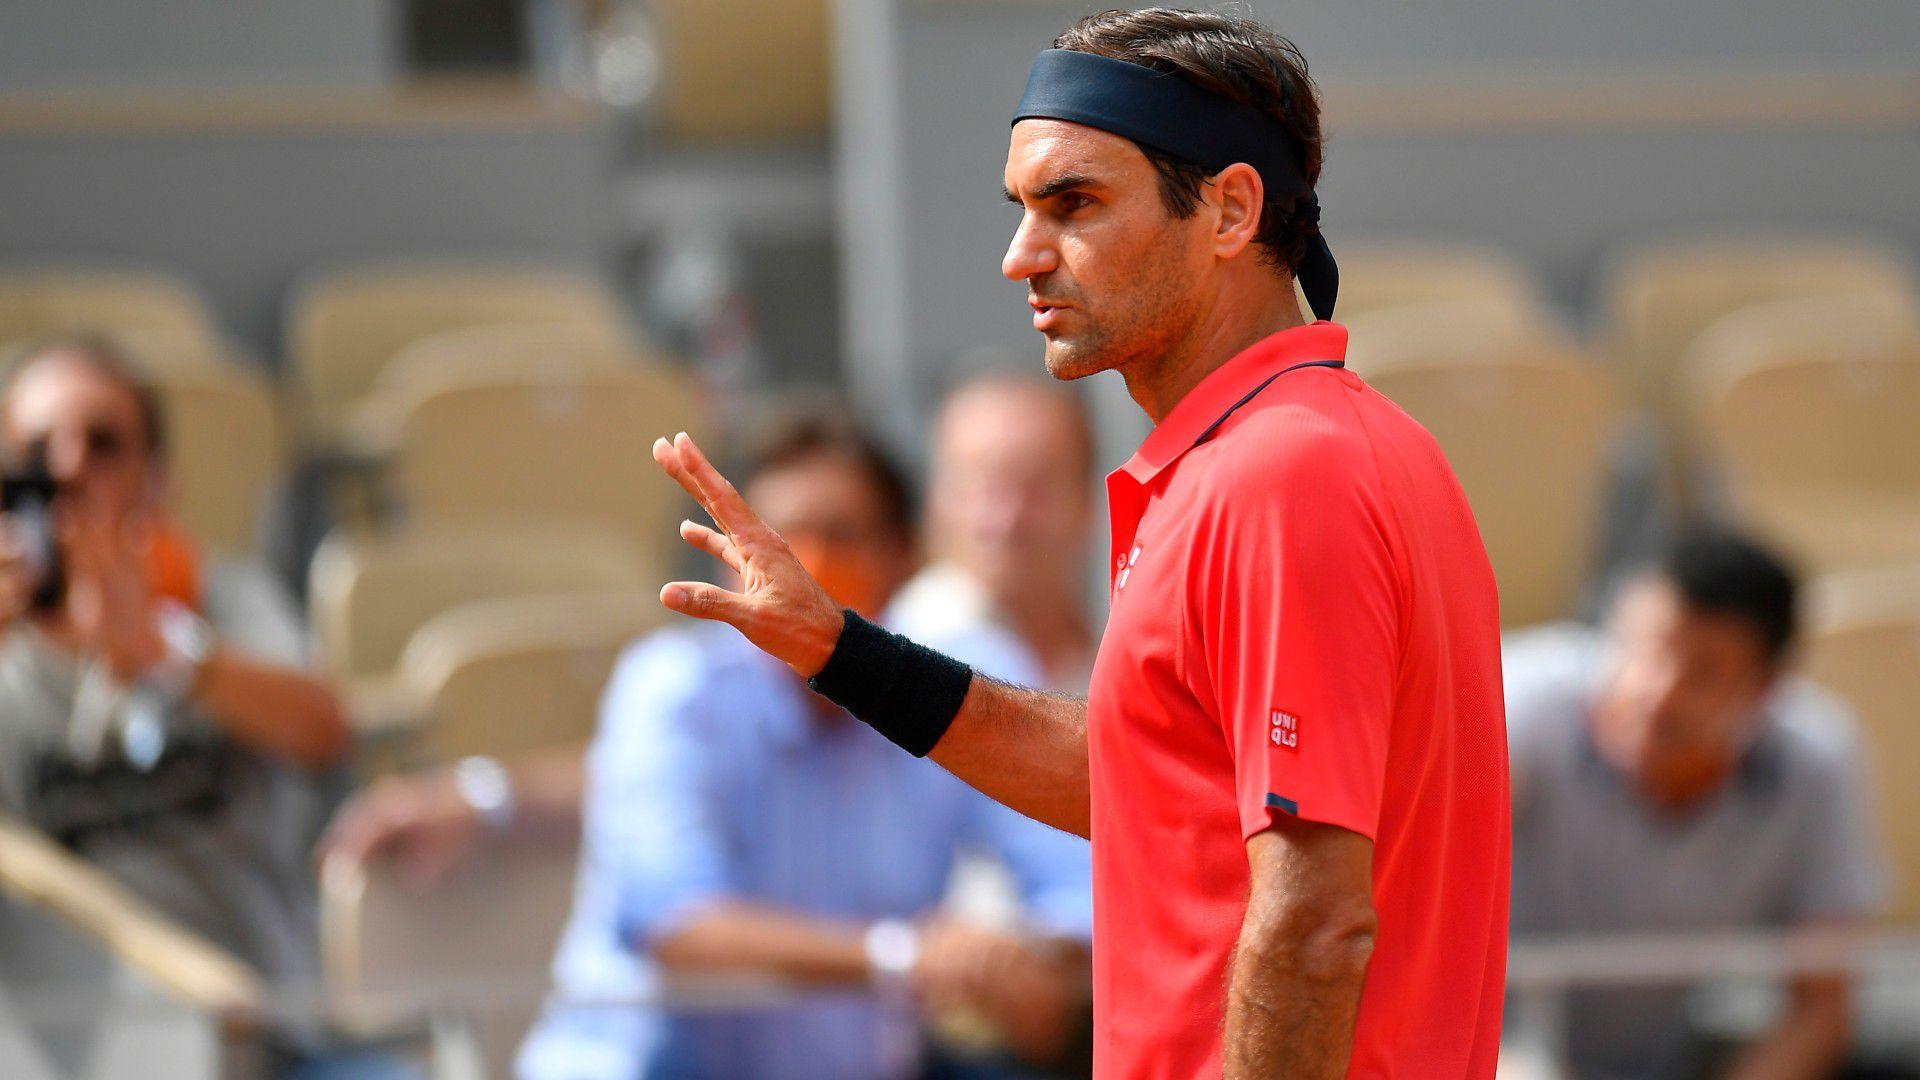 Novak Djokovic, Roger Federer through to third round